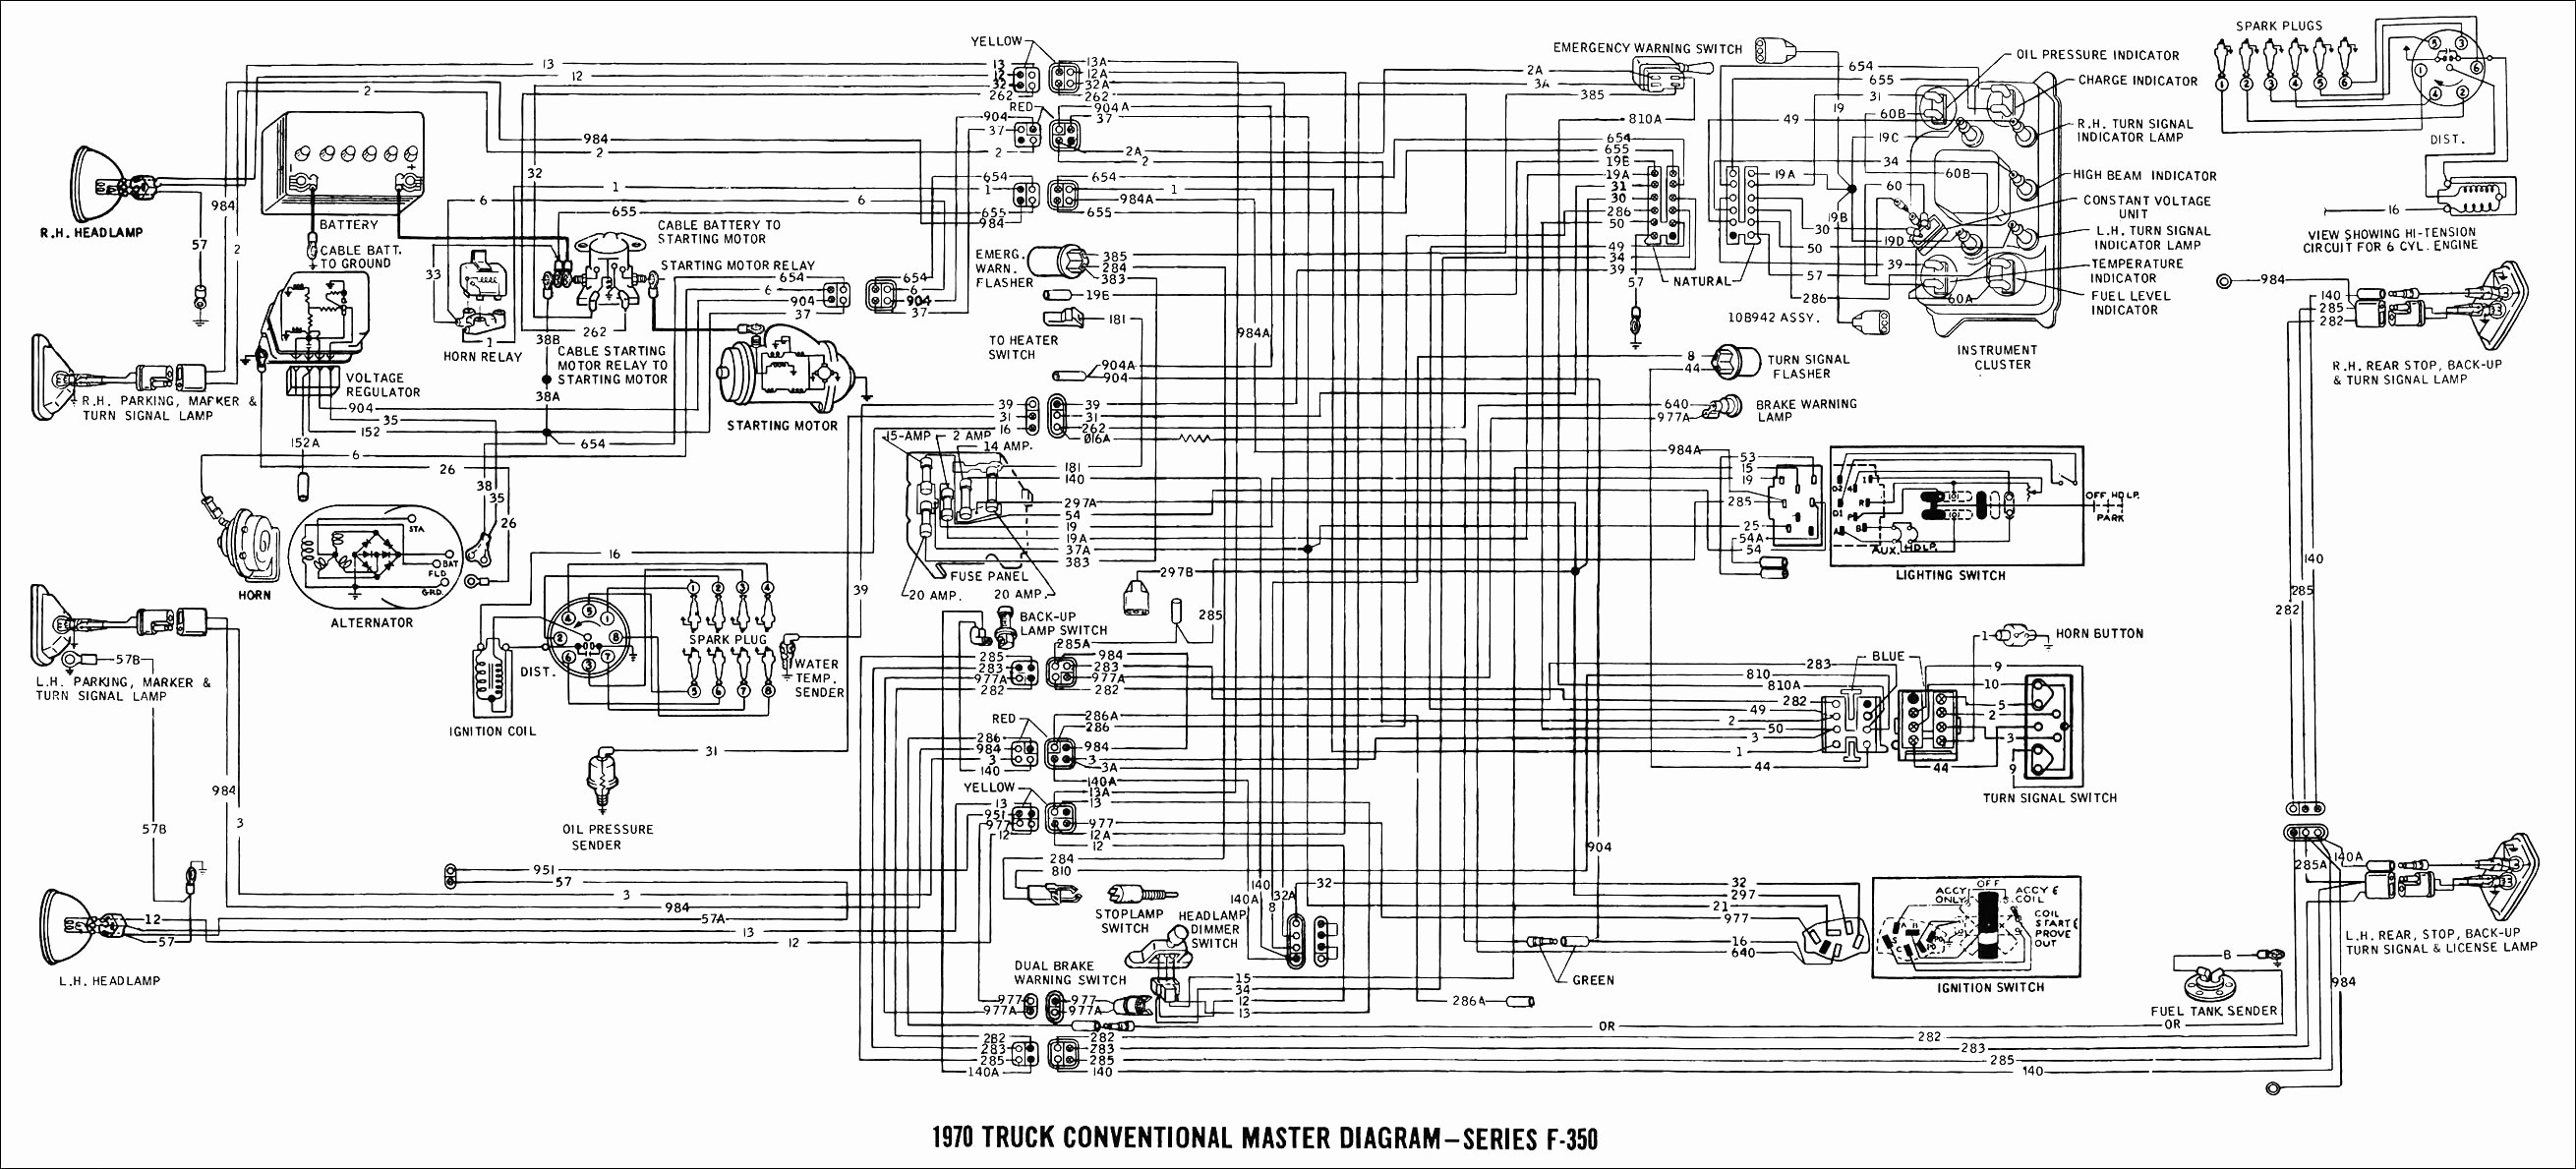 2010 ford escape engine diagram